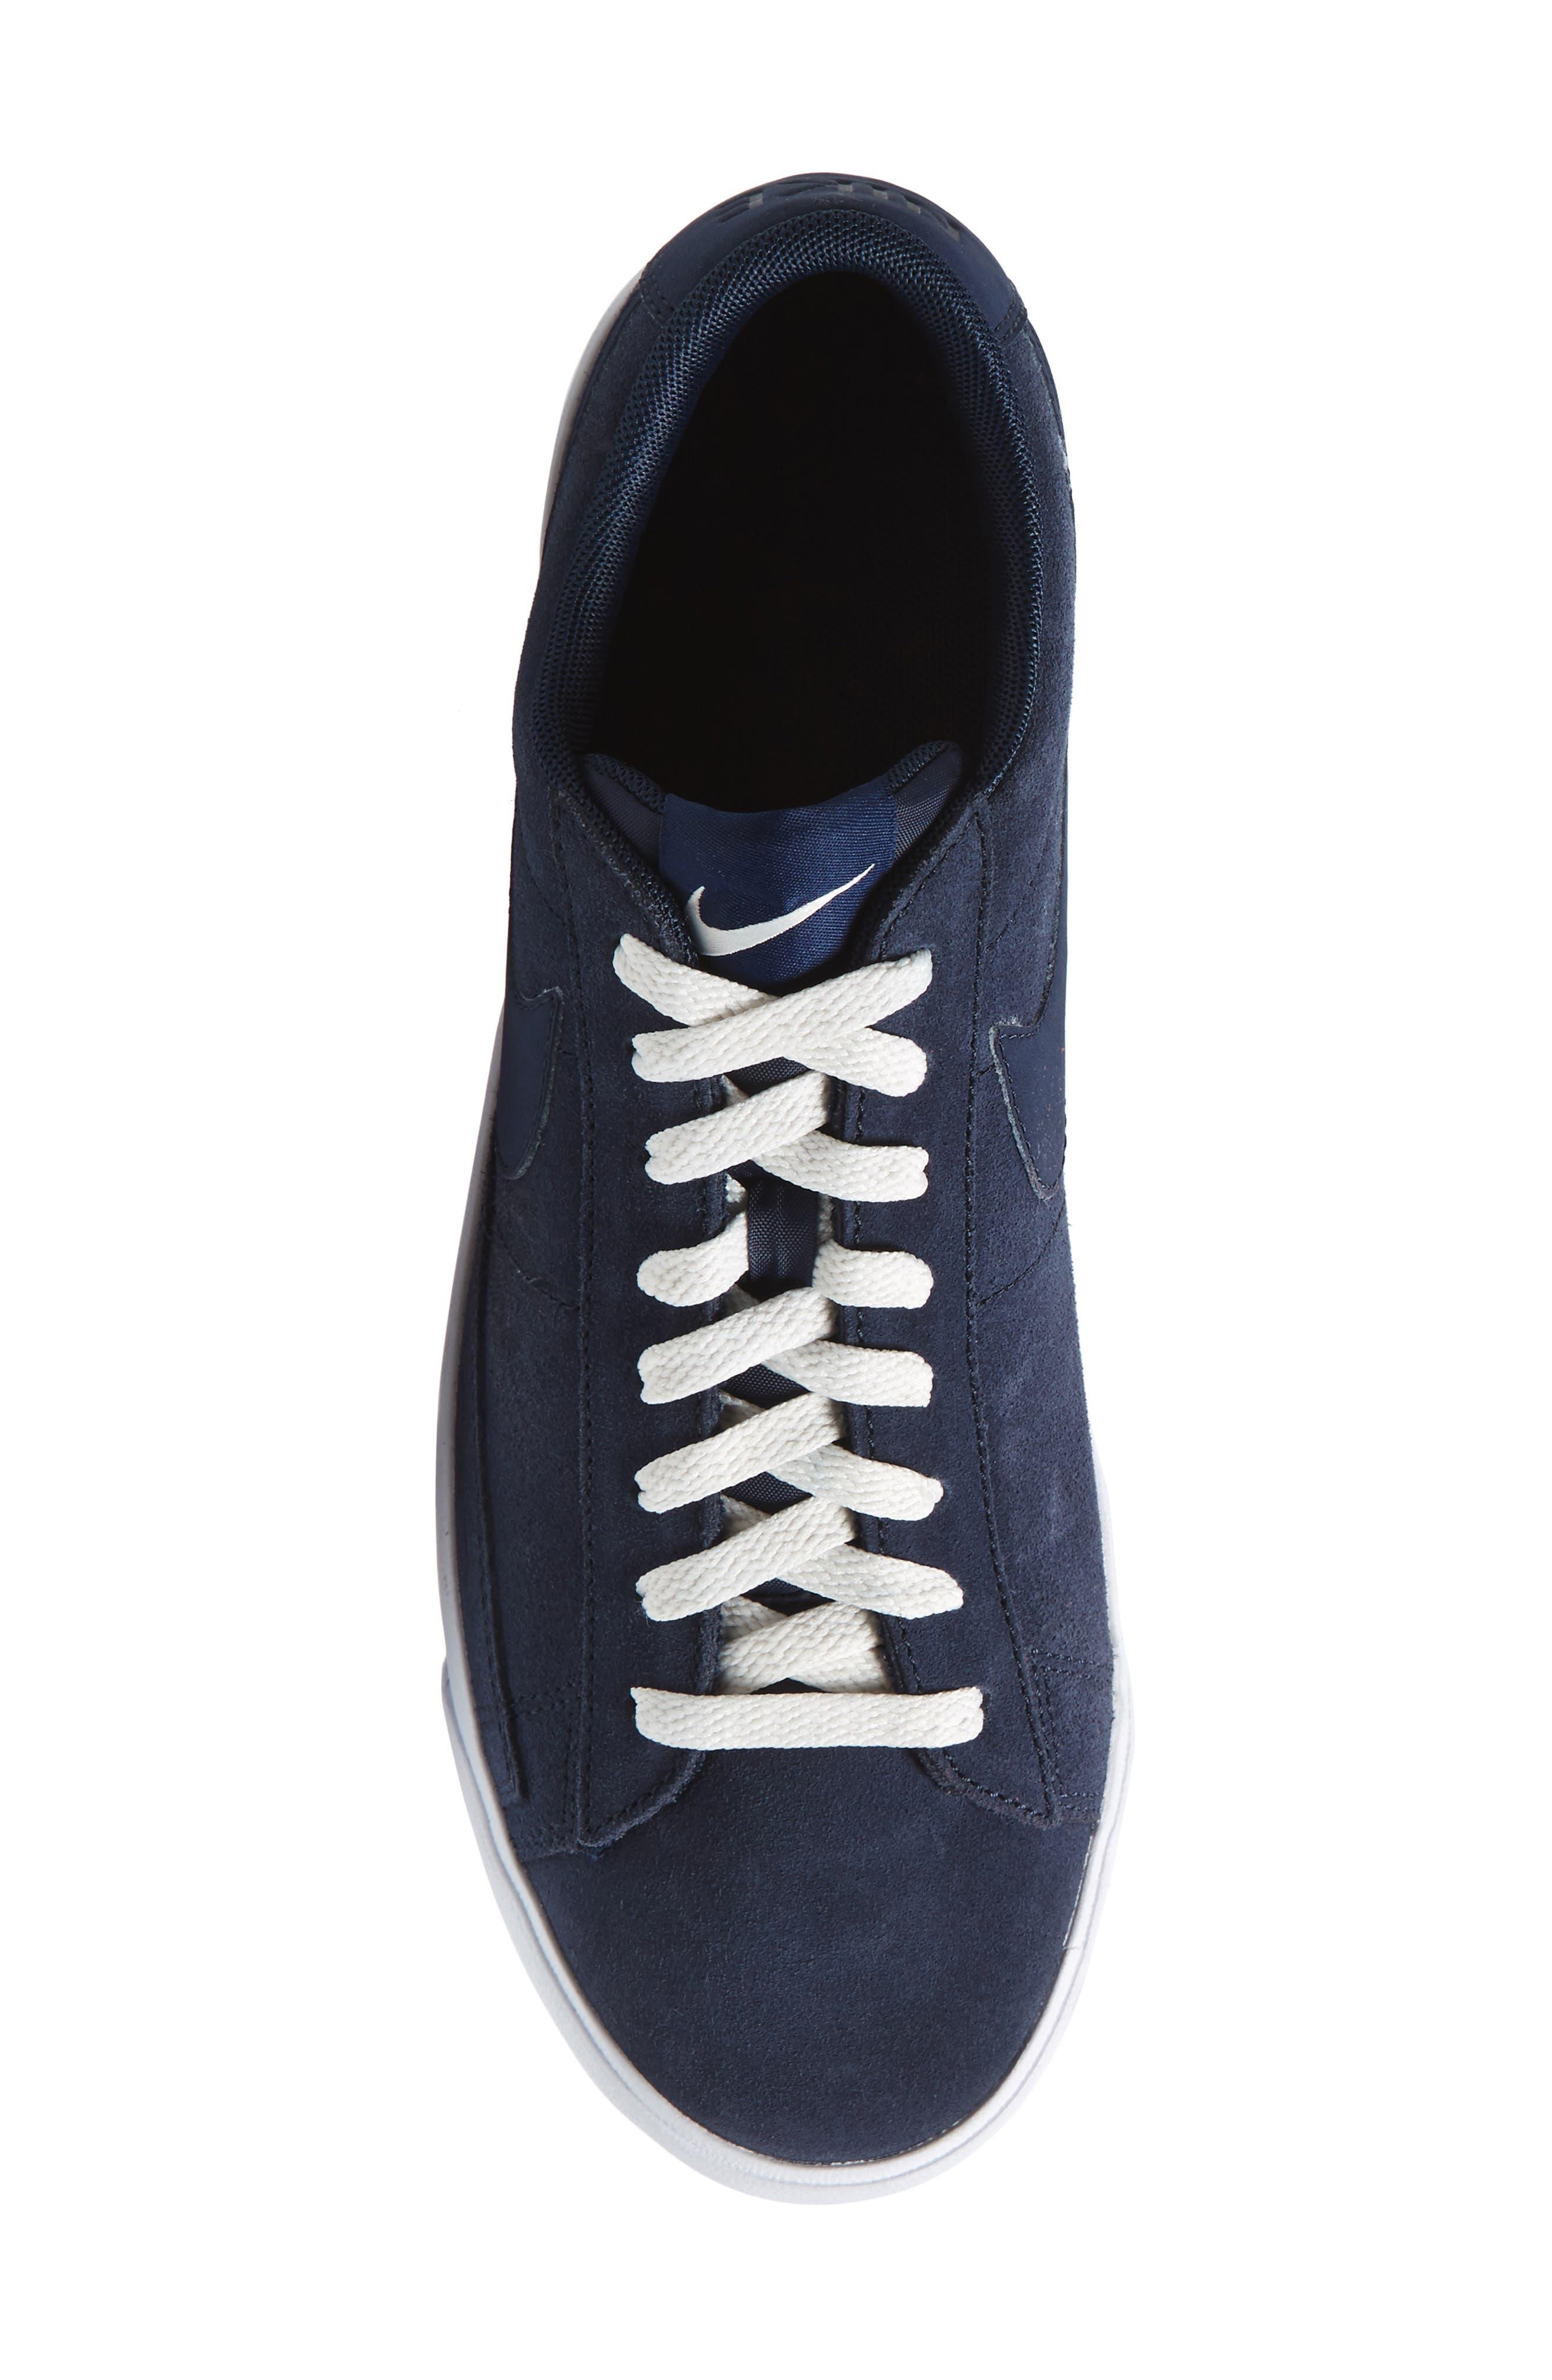 Blazer Low Suede Sneaker,                             Alternate thumbnail 5, color,                             Obsidian/ Sail/ Brown